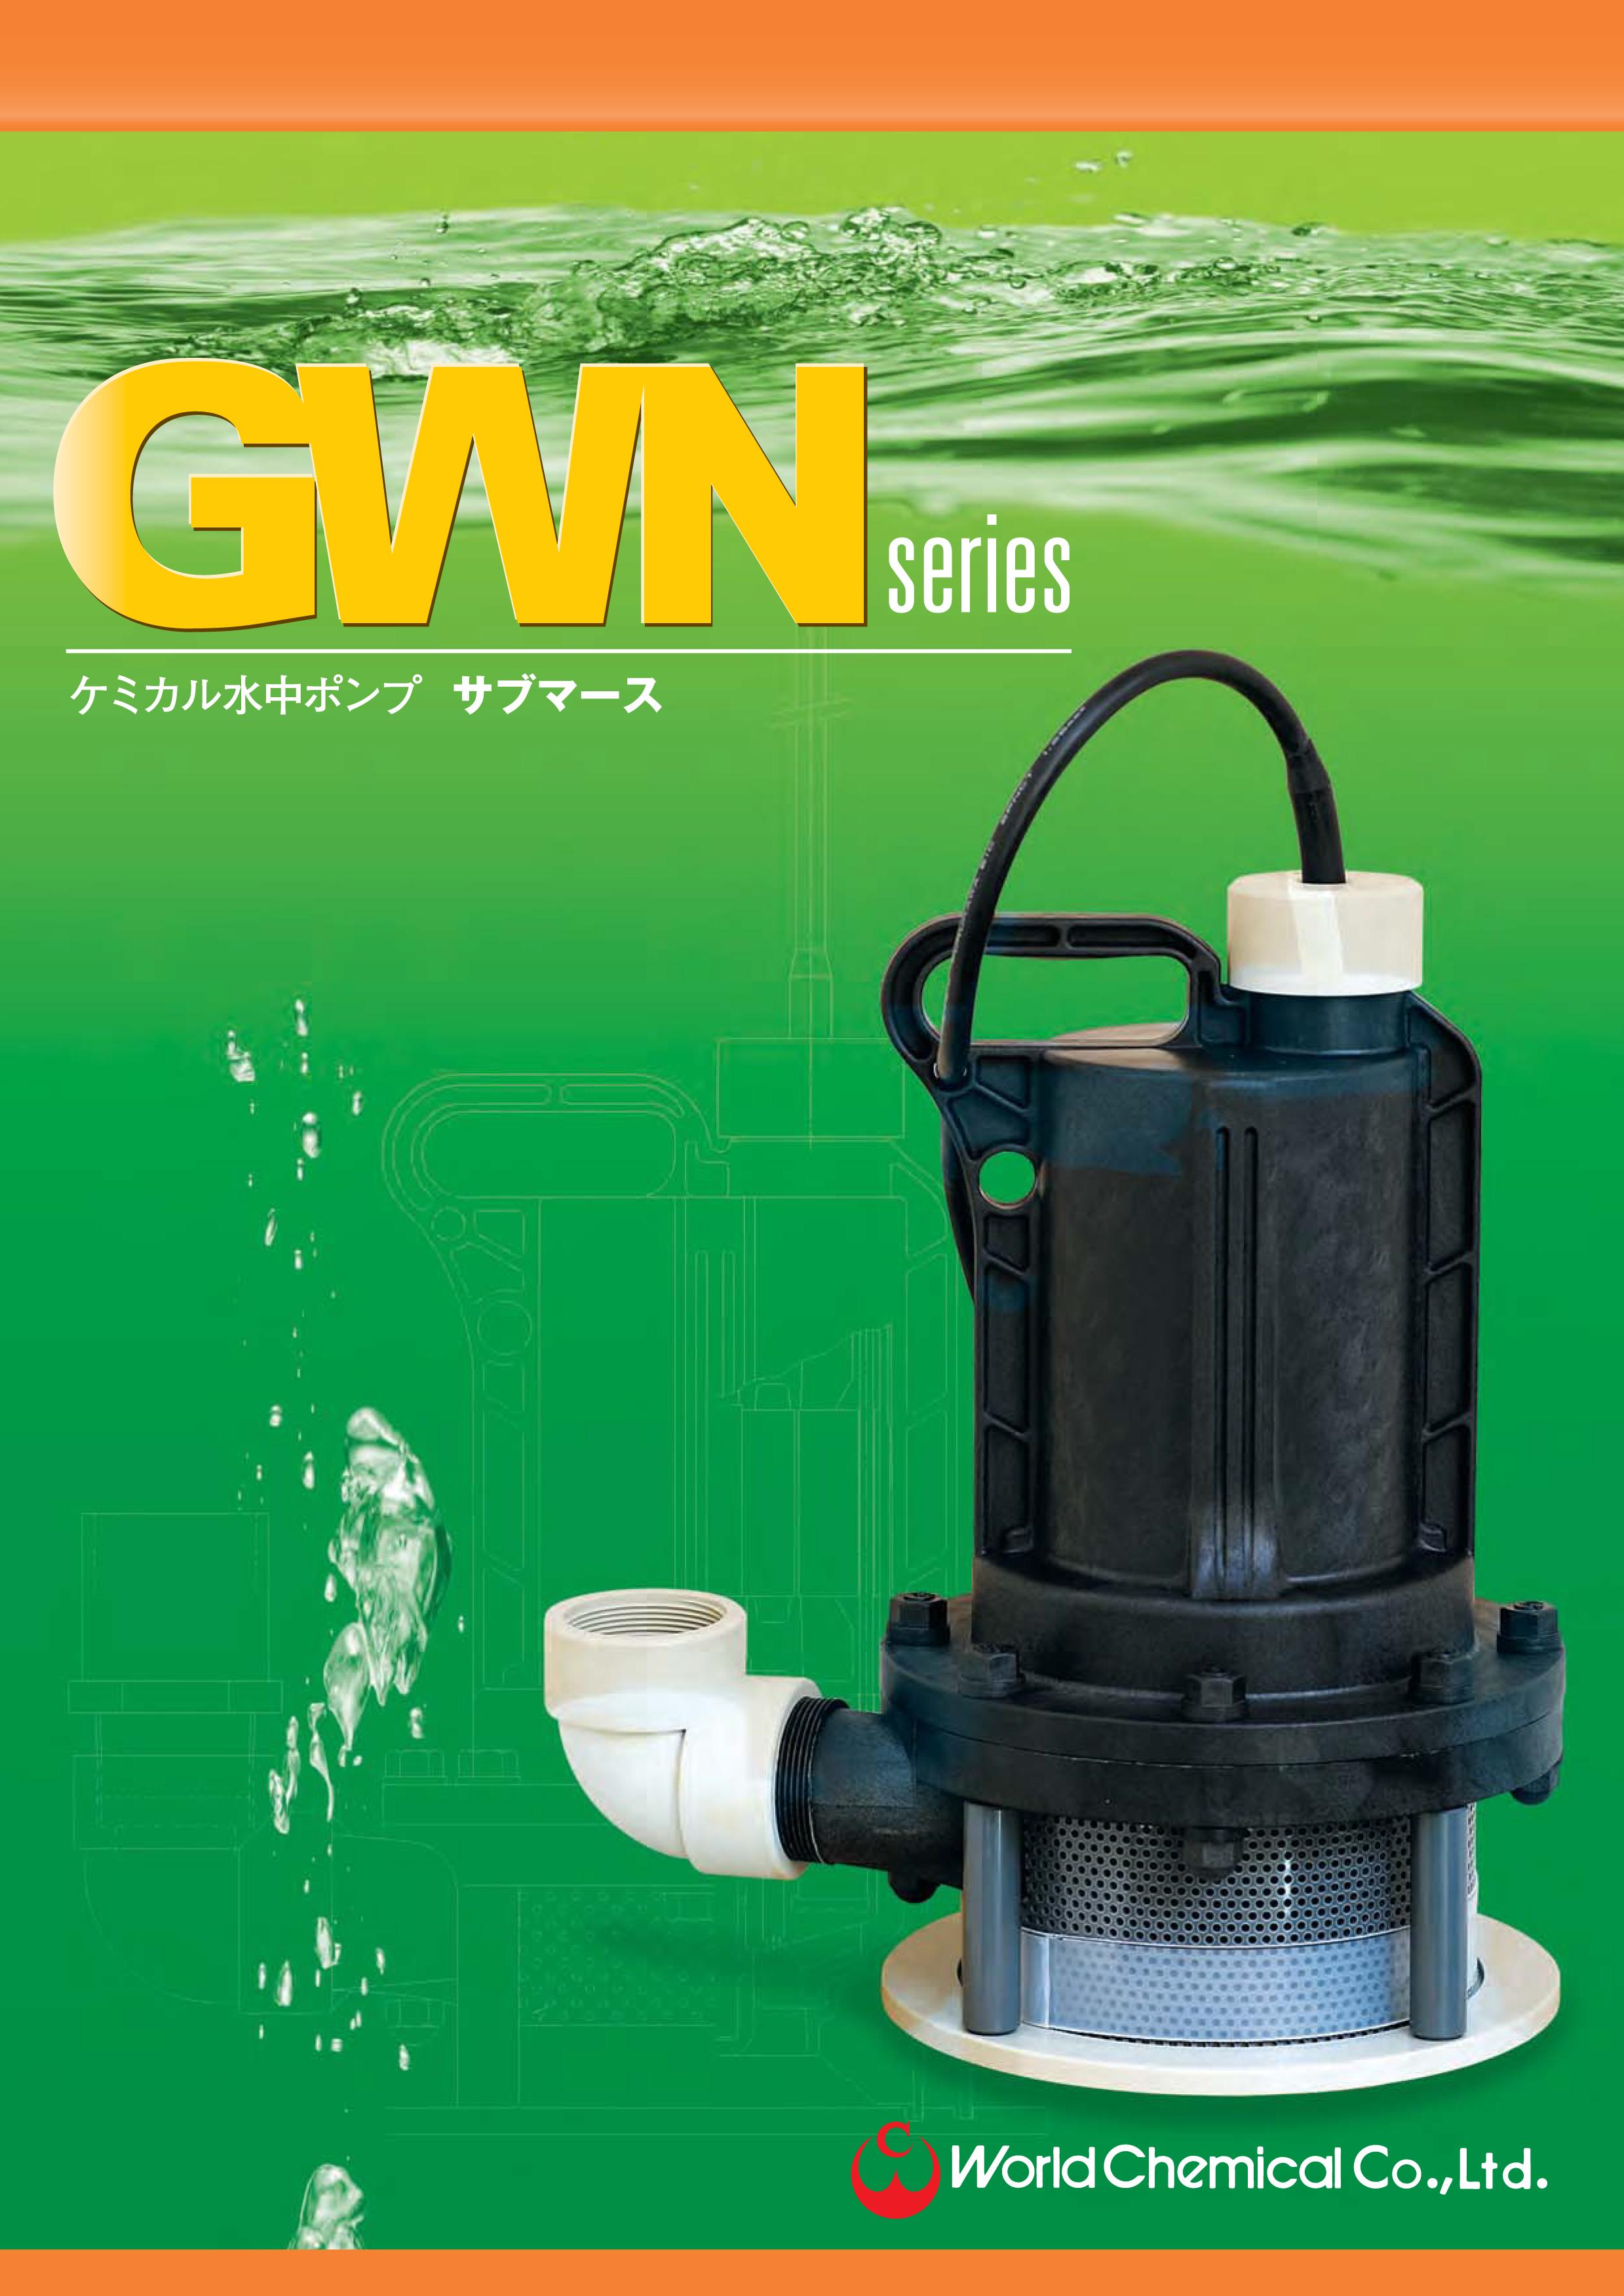 catalog_image_GWN_201511.jpg